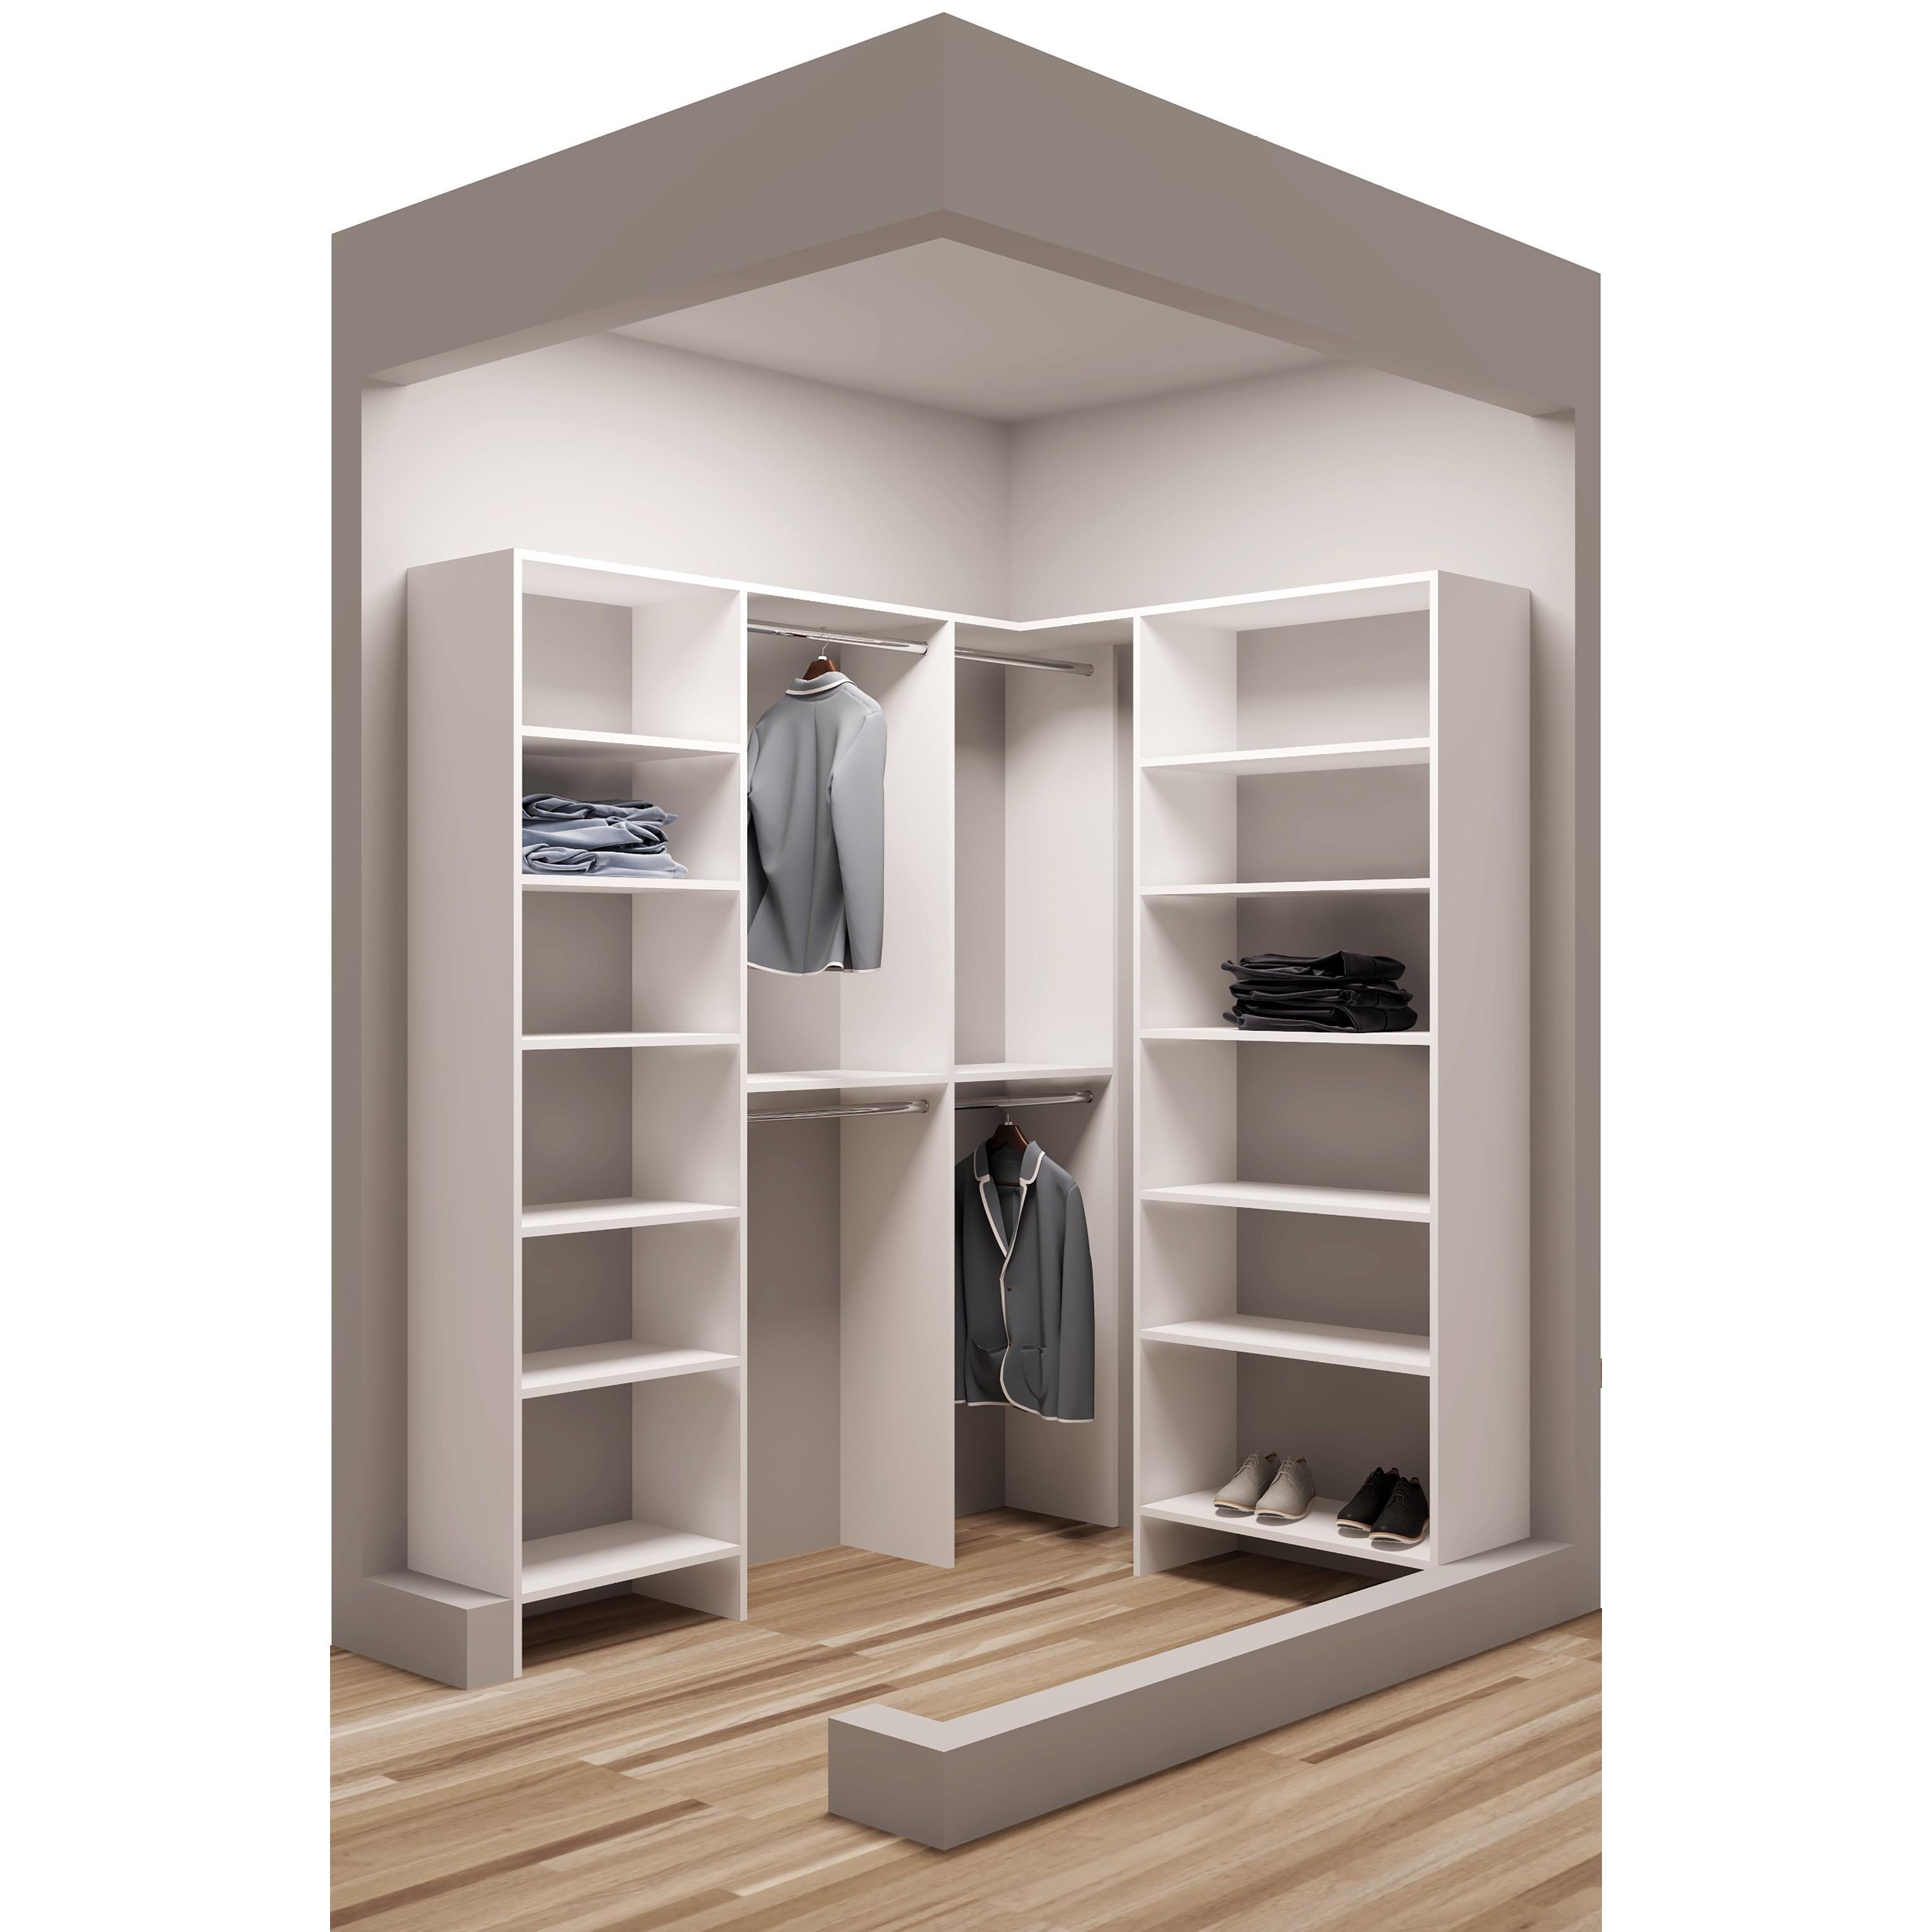 TidySquares White Wood 75 x 65.5  Walk-in Closet System